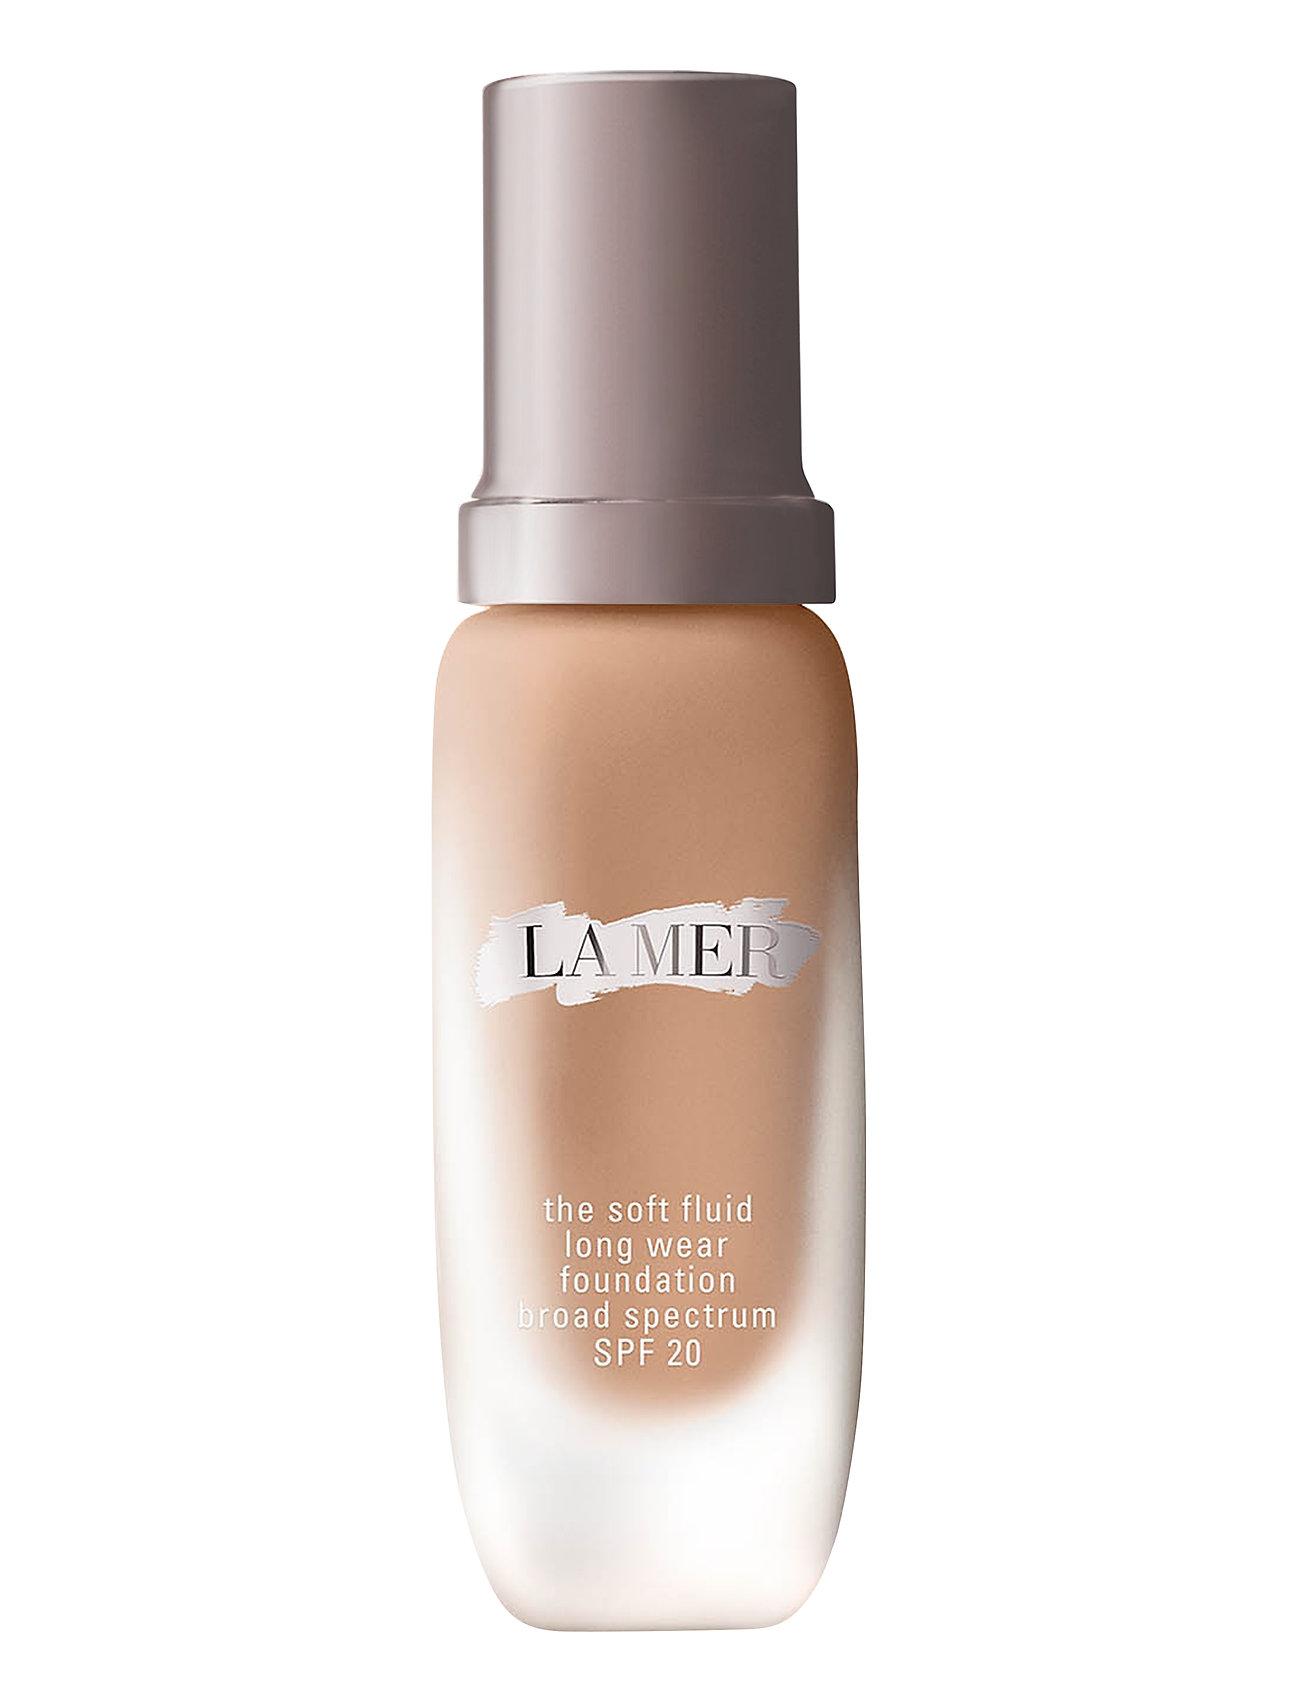 Image of The Soft Fluid Long Wear Foundation Spf20 Foundation Makeup La Mer (3421206763)